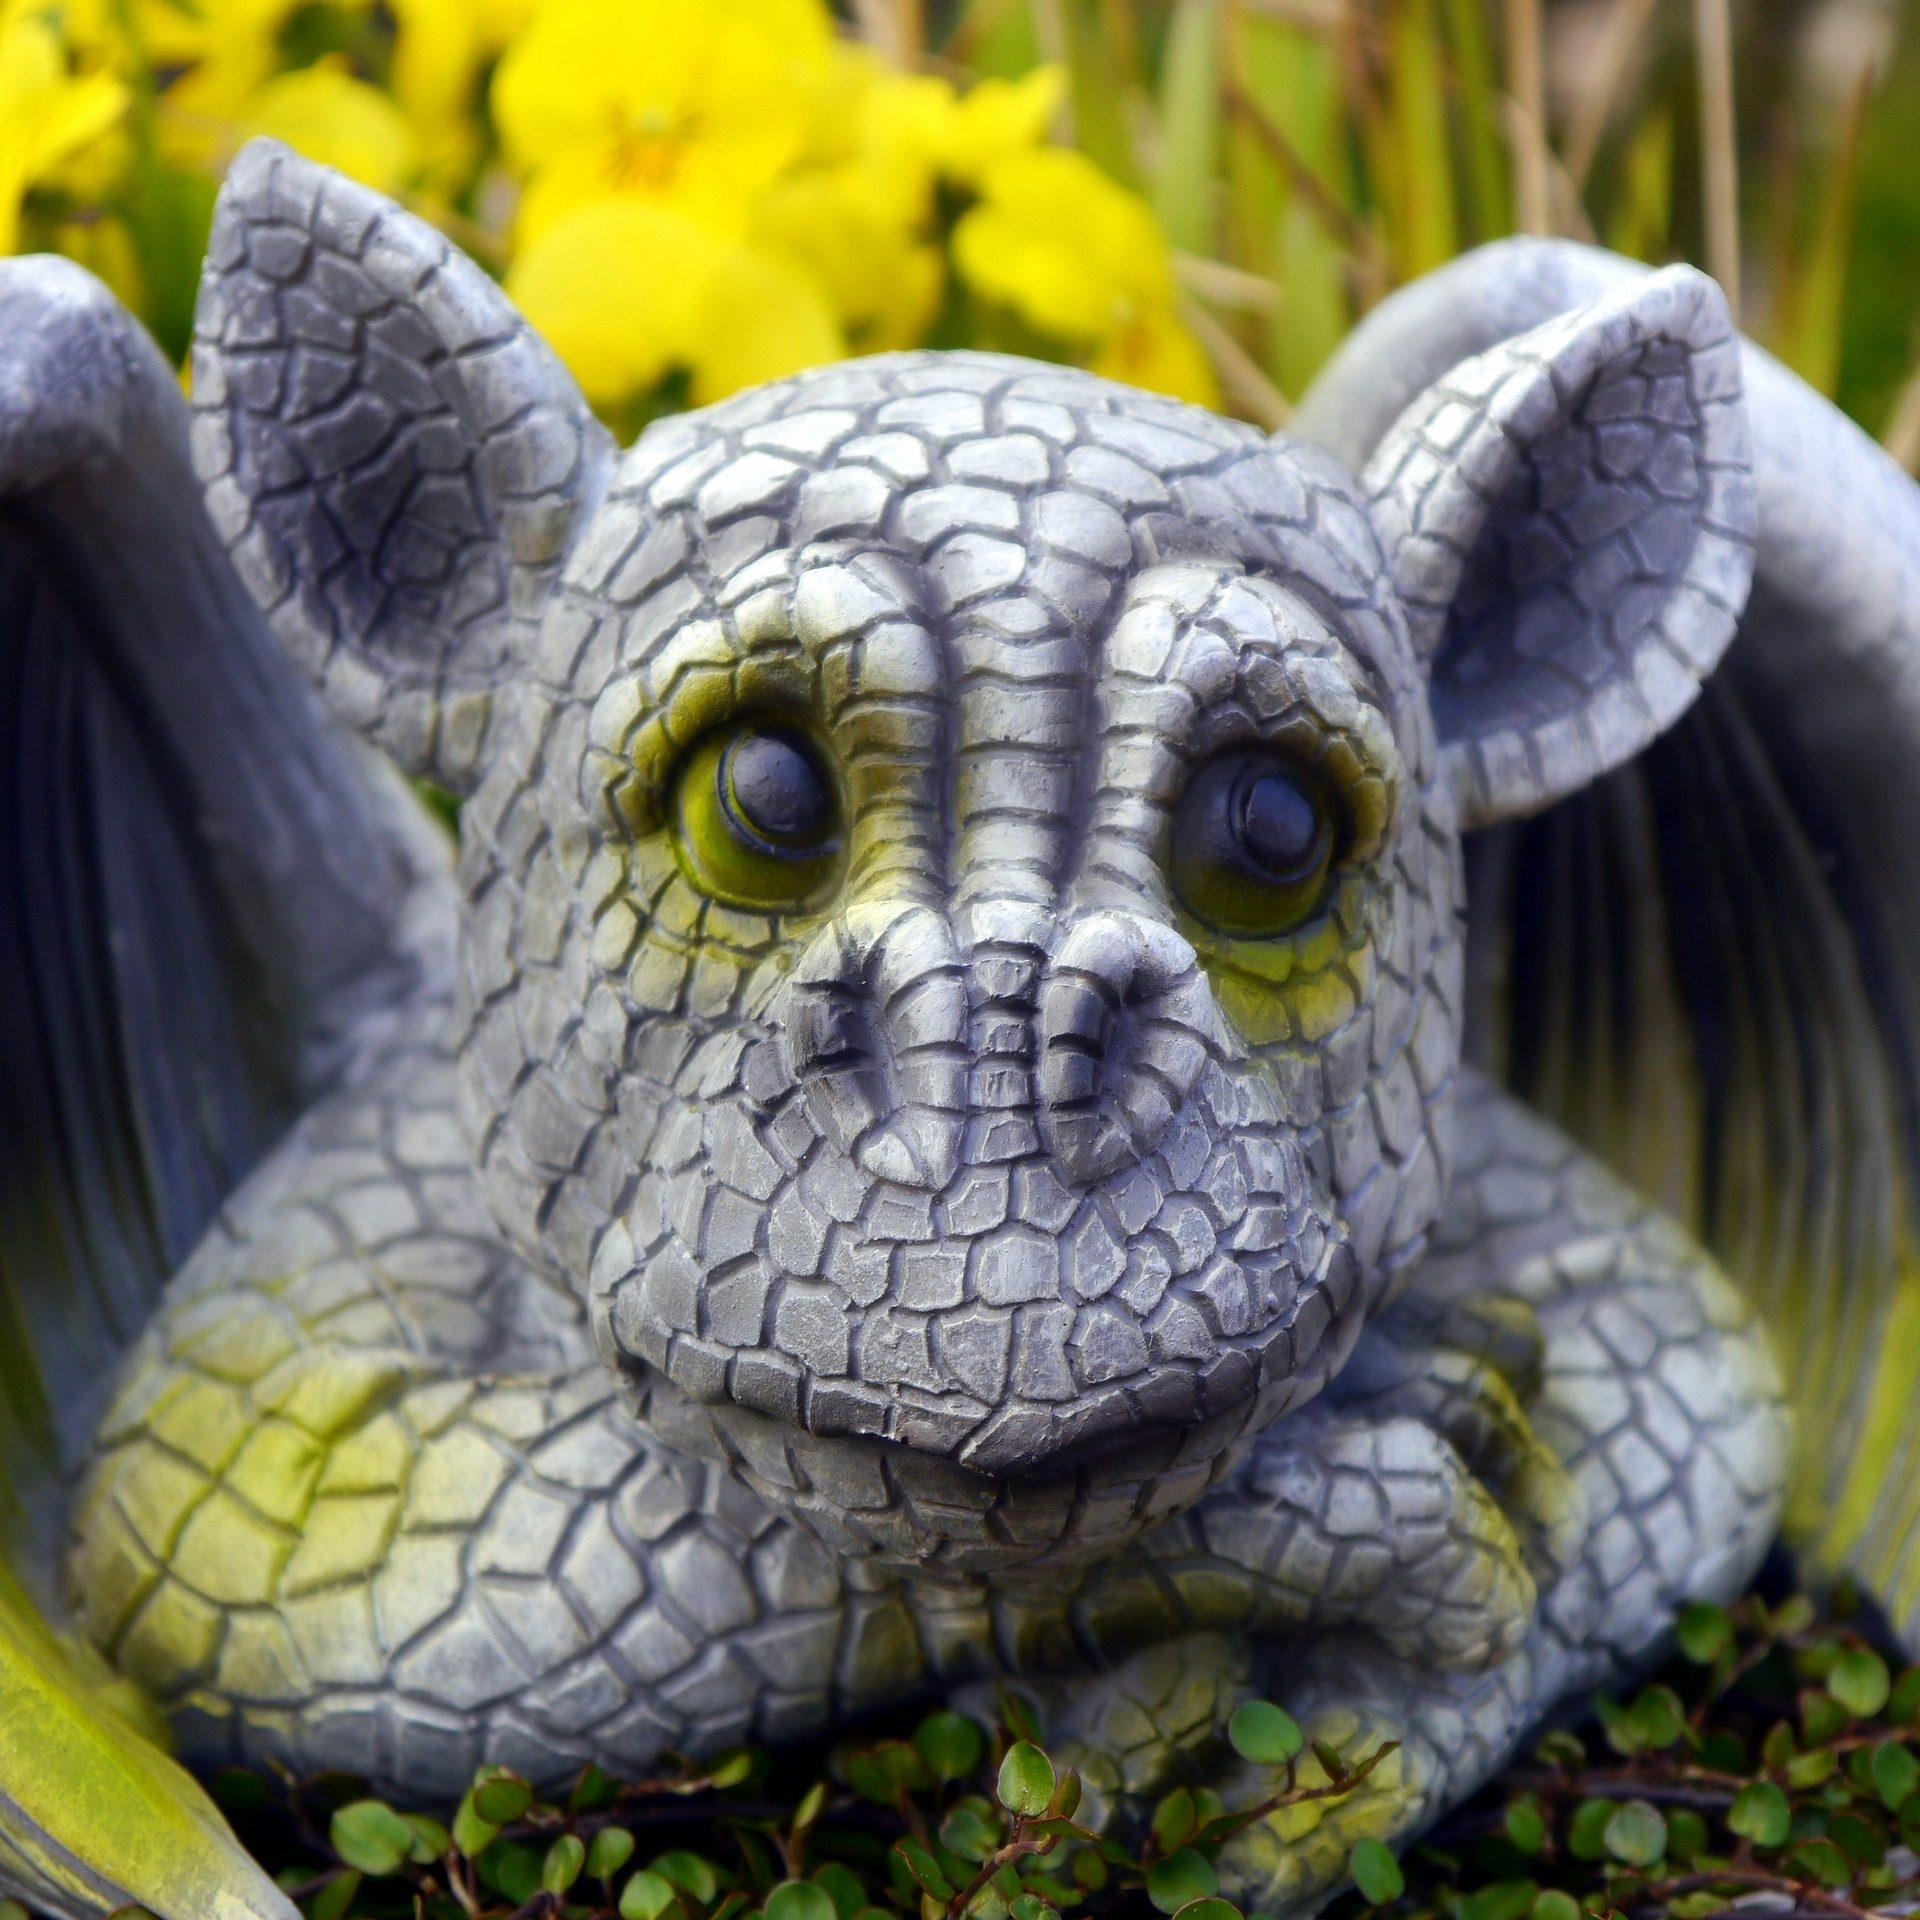 dragón, figura, escultura, jardín, muñeco - Fondos de Pantalla HD - professor-falken.com